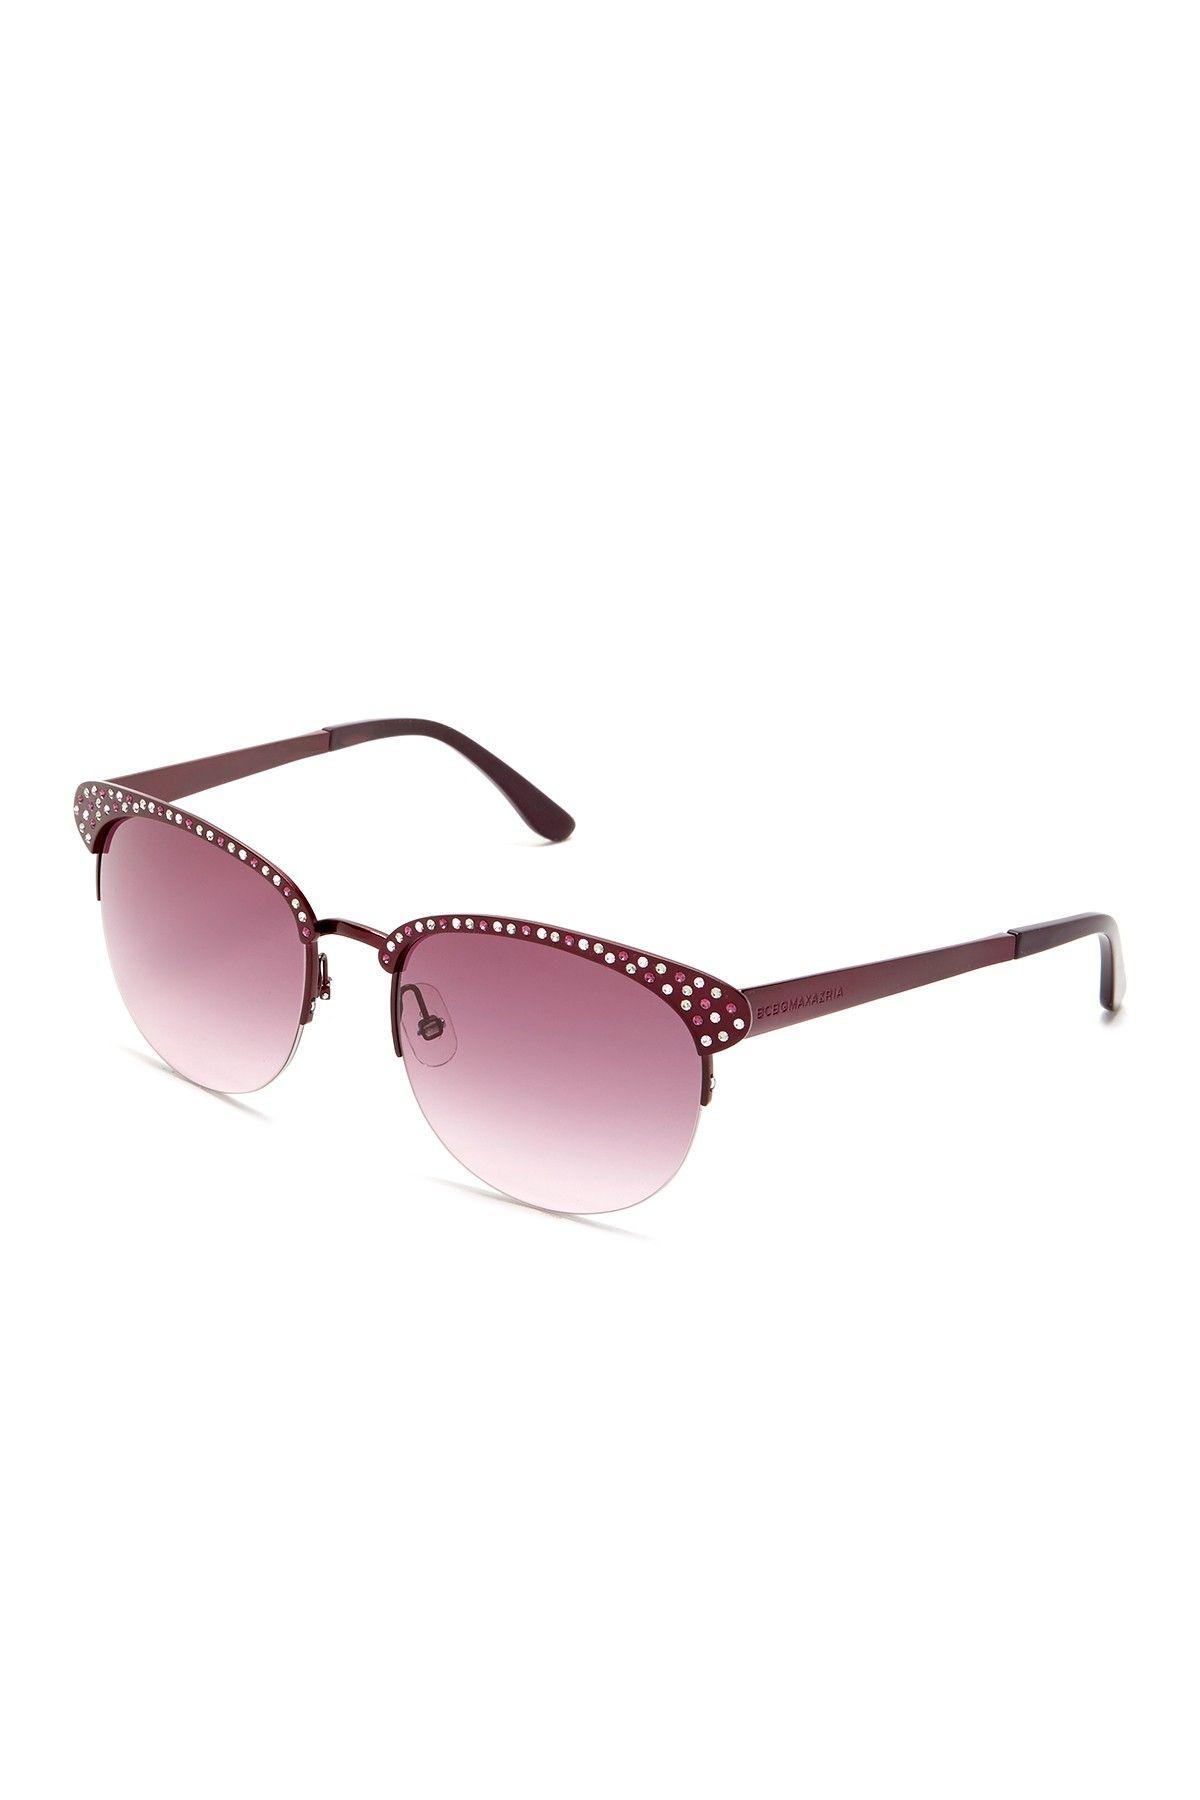 Rhinestone Trim Sunglasses by BCBGMAXAZRIA on @nordstrom_rack